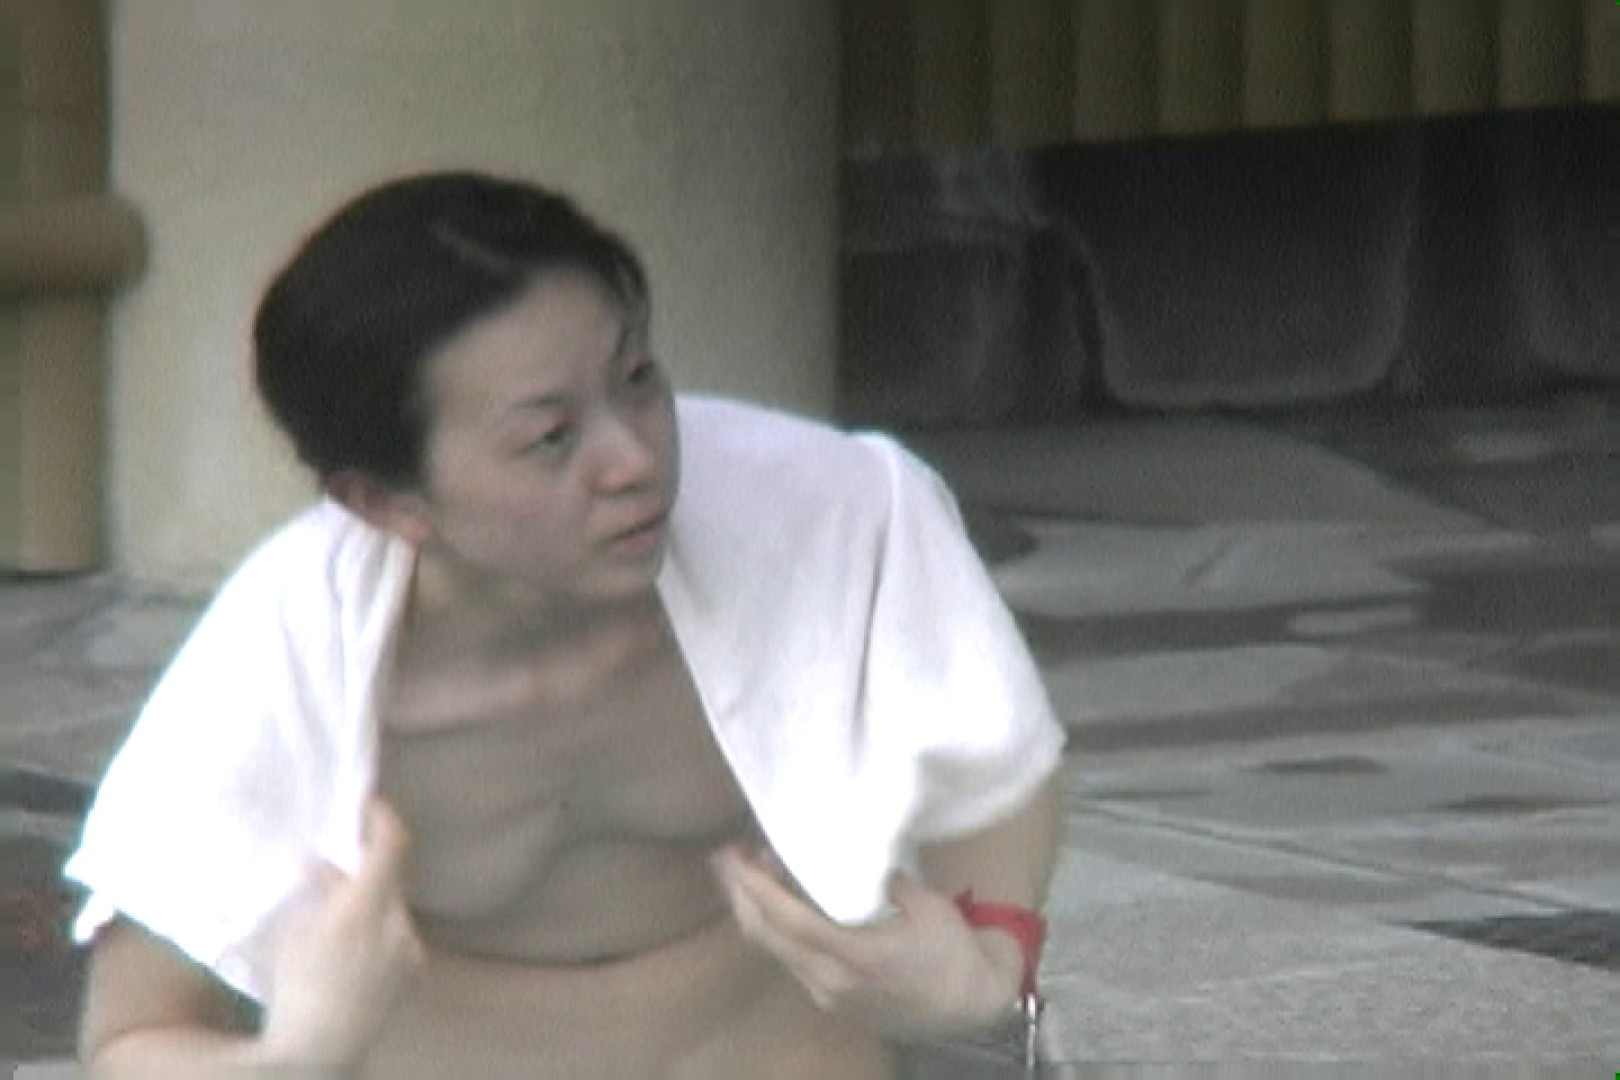 Aquaな露天風呂Vol.693 露天風呂編 | 盗撮シリーズ  105PIX 77